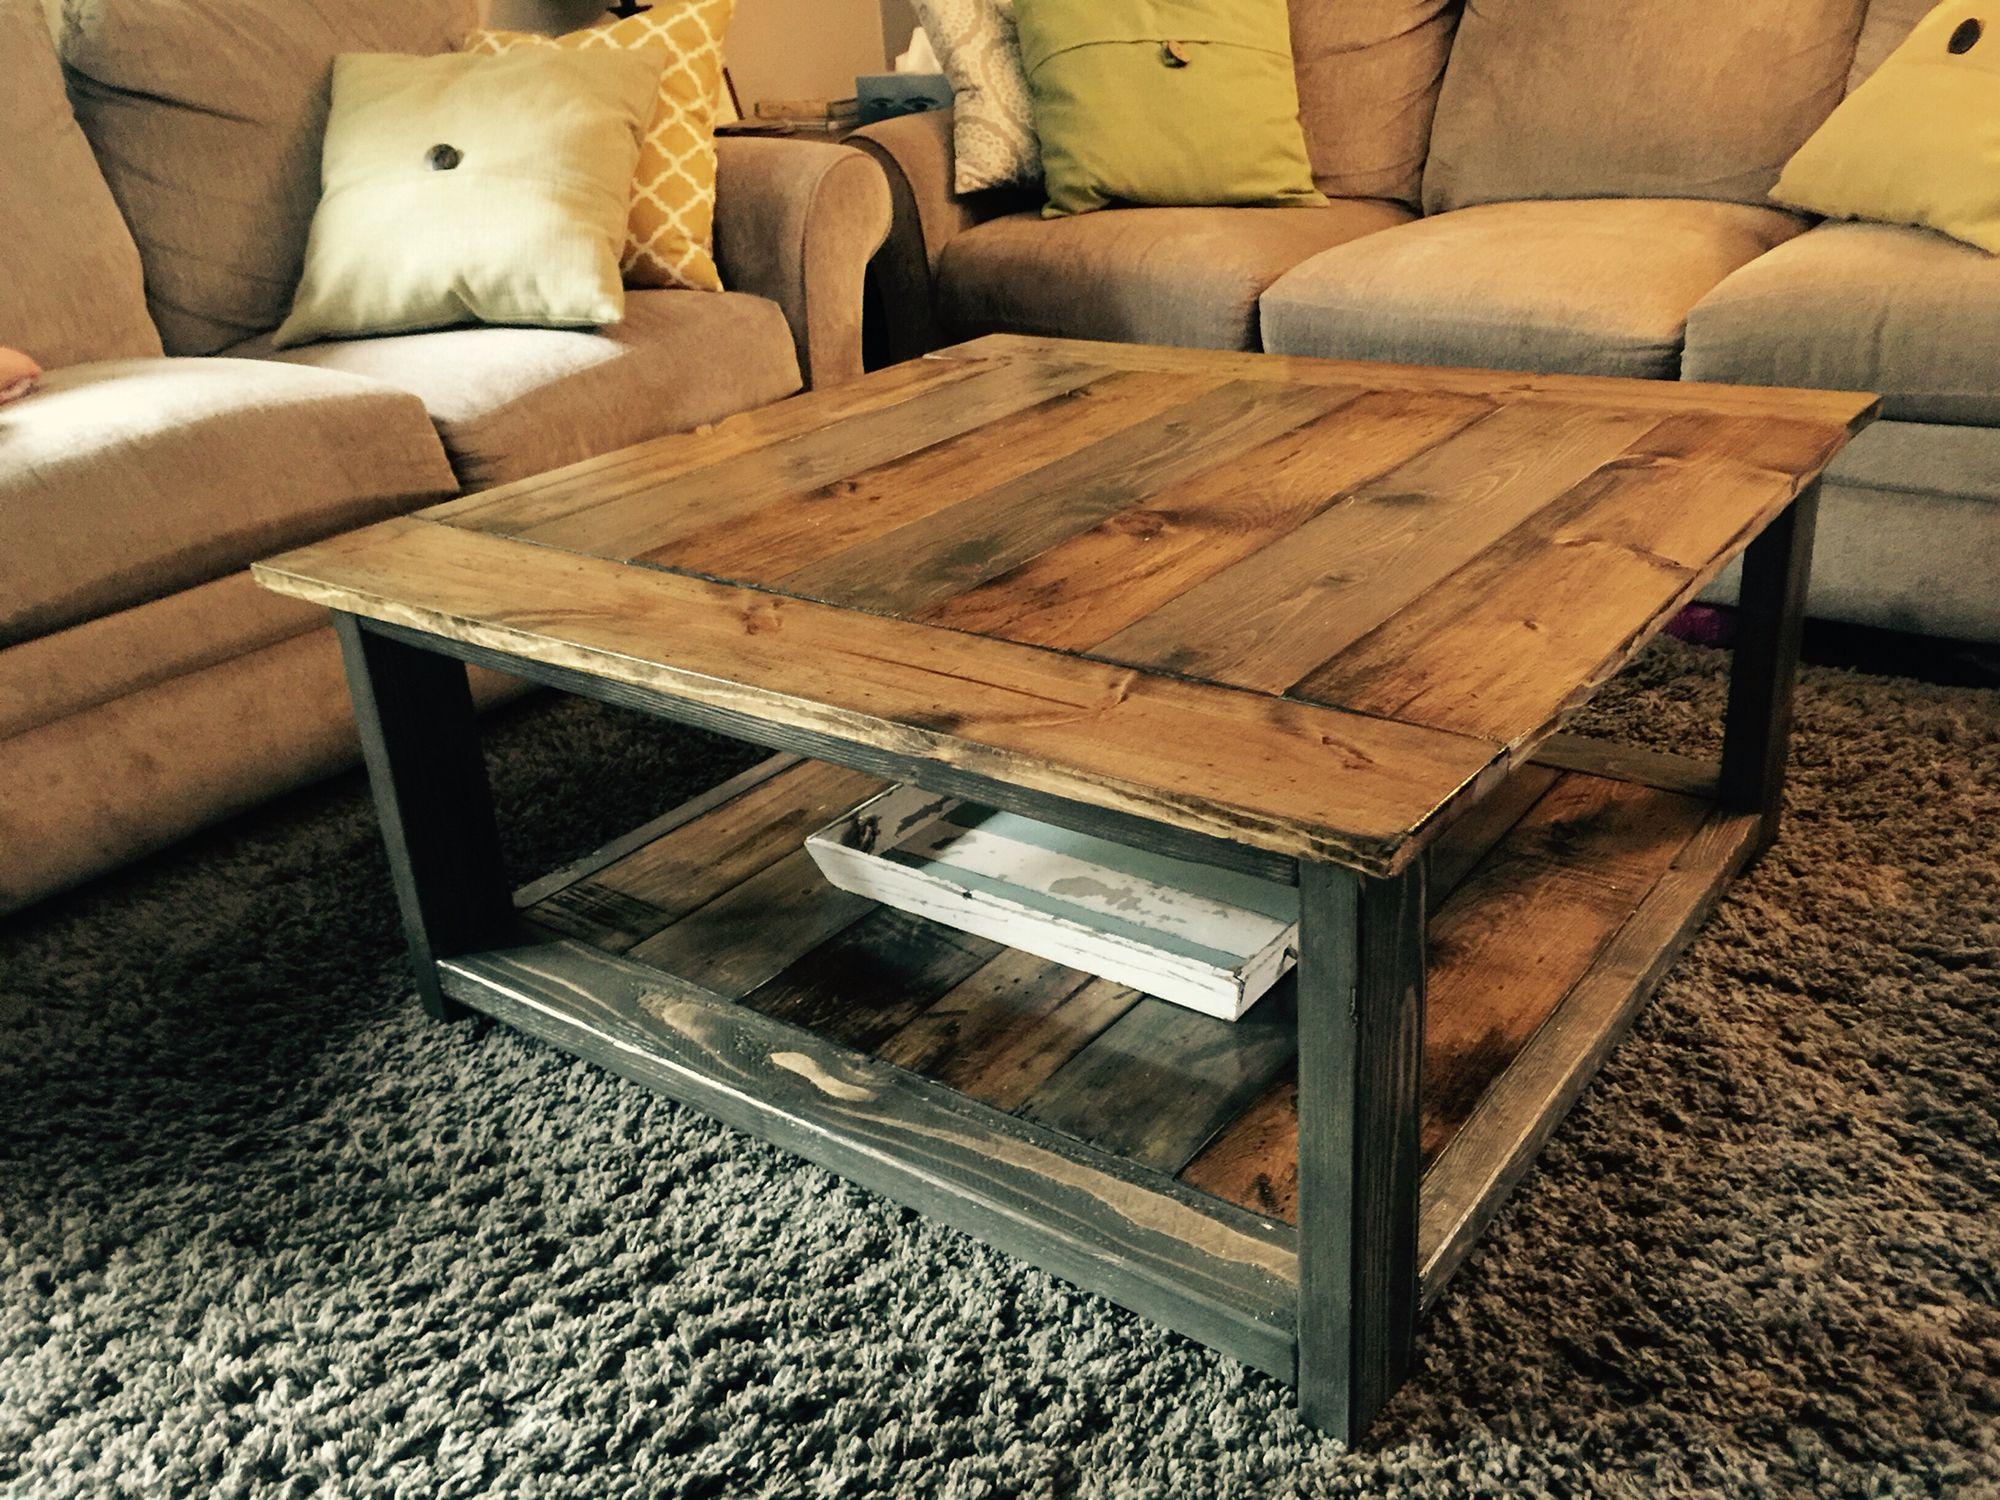 RusticX coffee table. Ana White plans. Minwax dark walnut